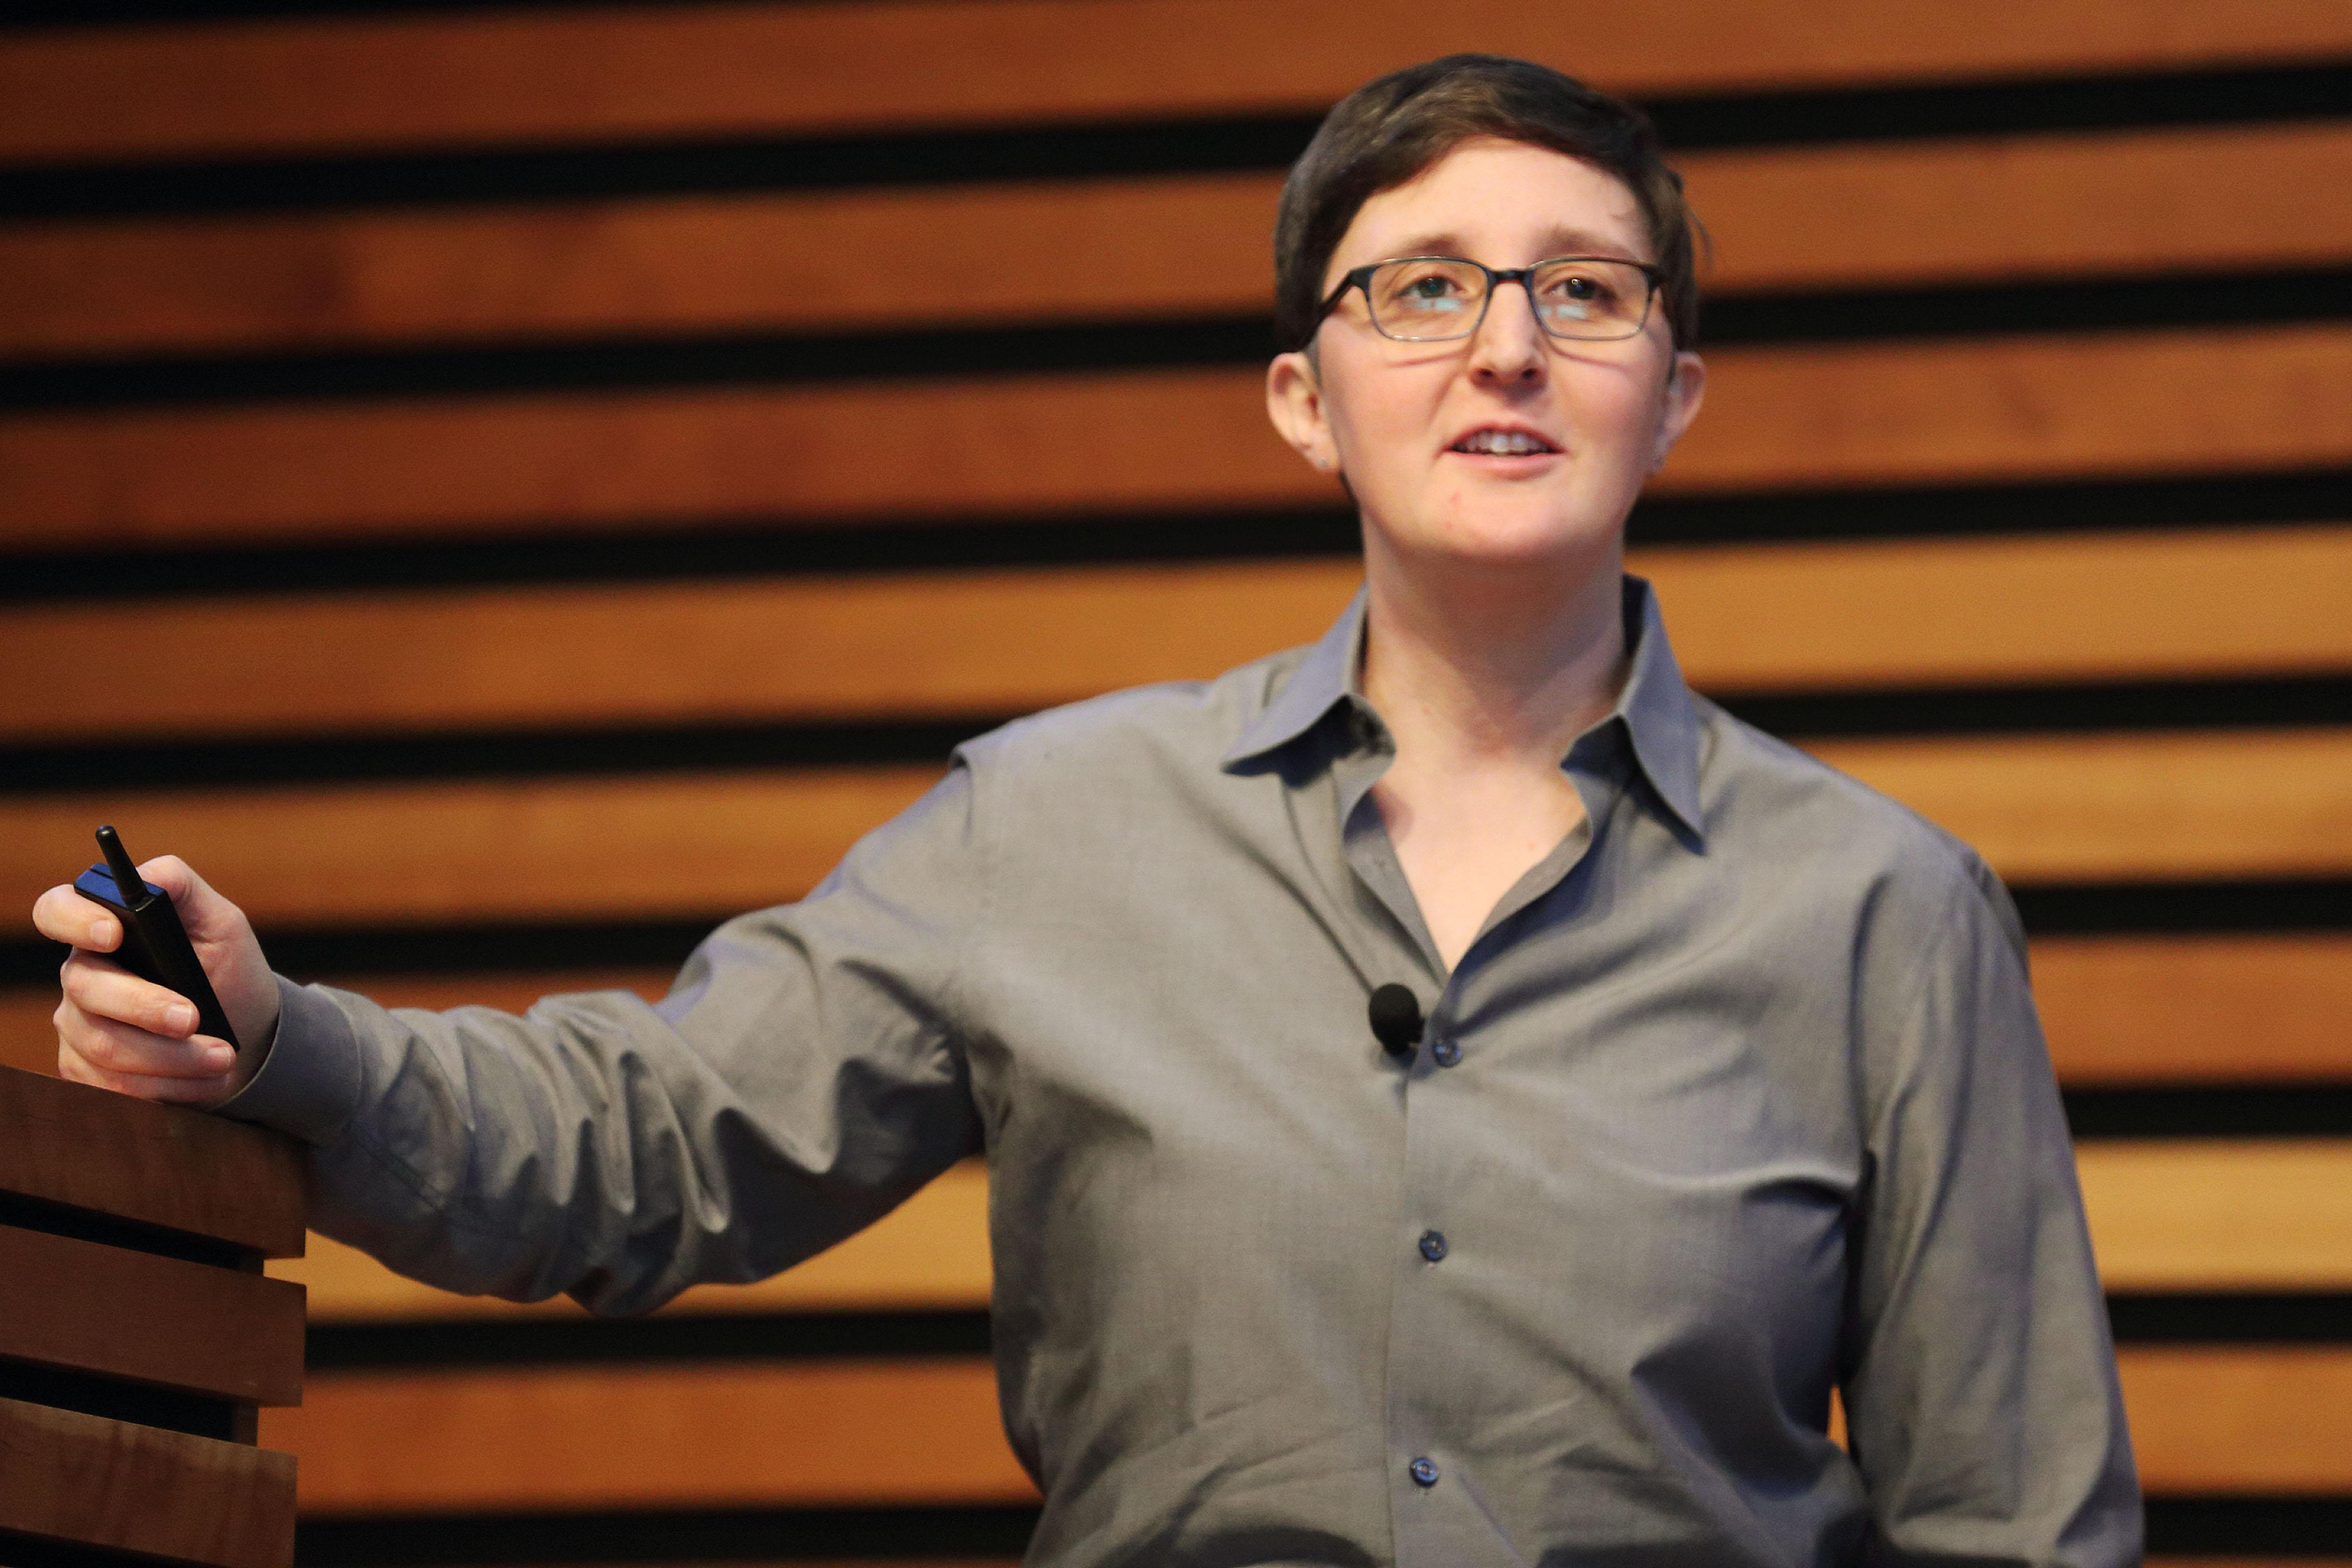 Ontario Chief Digital Officer Hillary Hartley